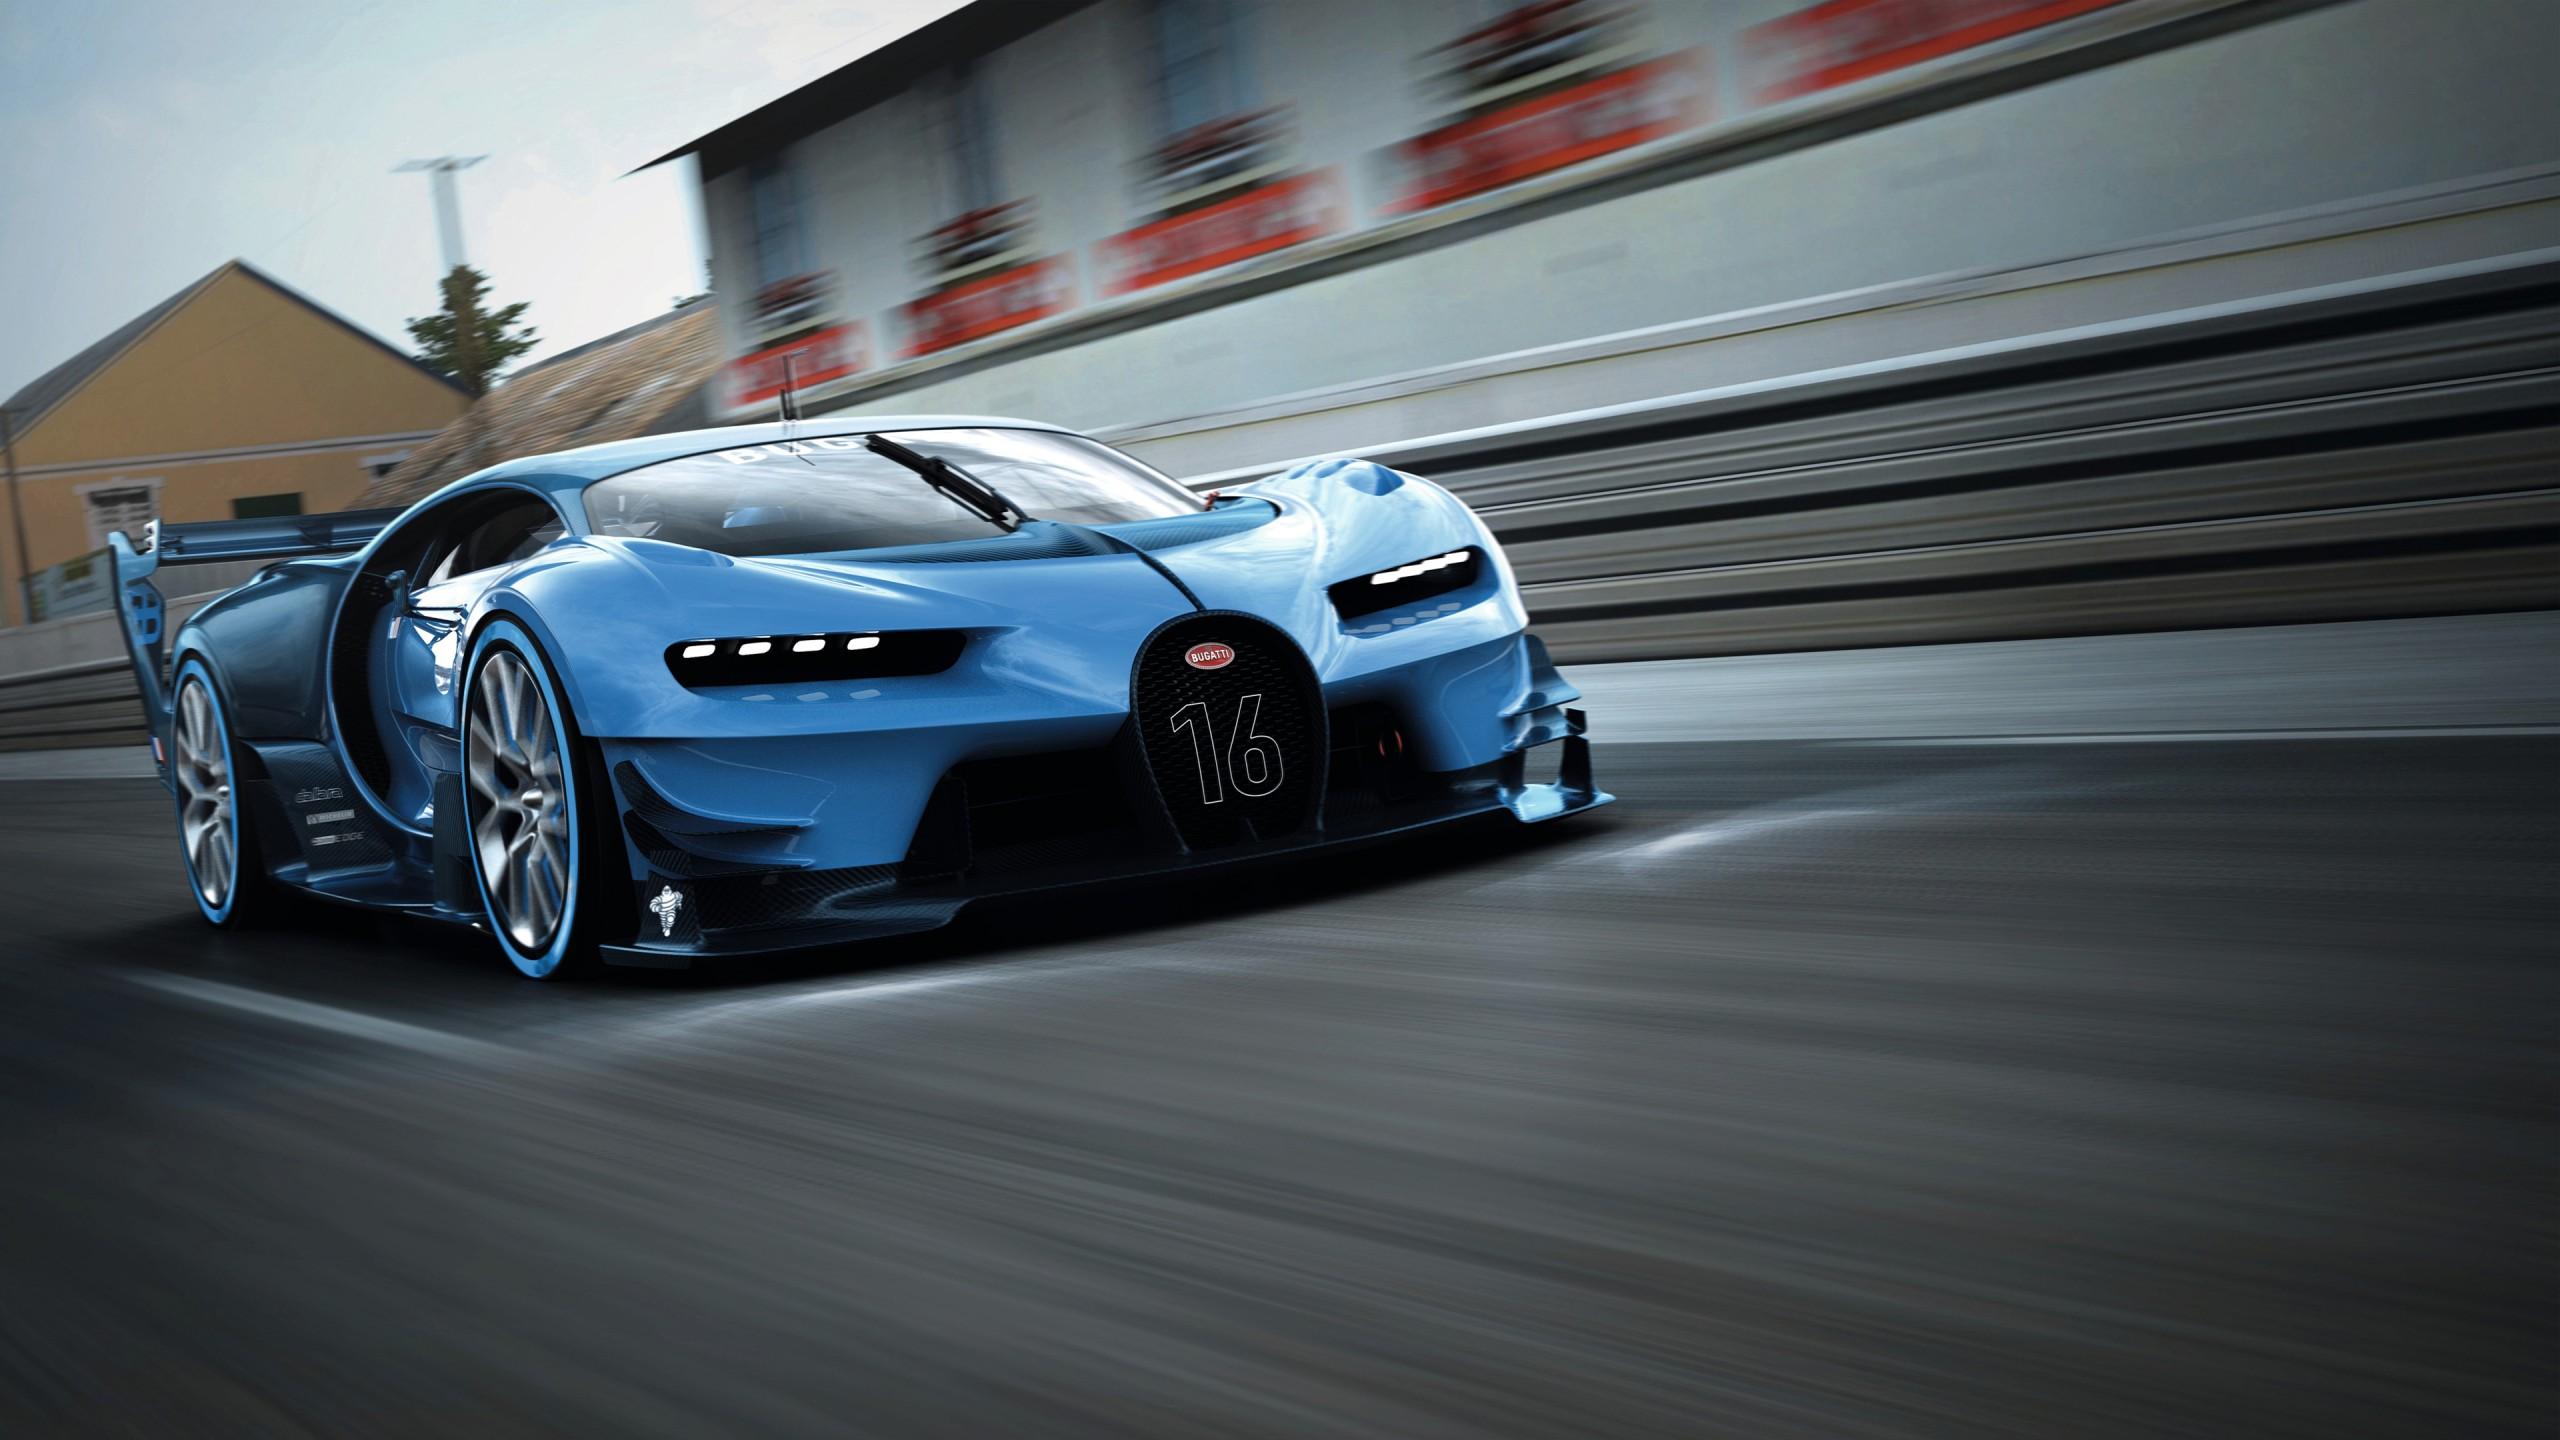 Widescreen Car Wallpapers Hd Bugatti Vision Gran Turismo 2015 Wallpaper Hd Car